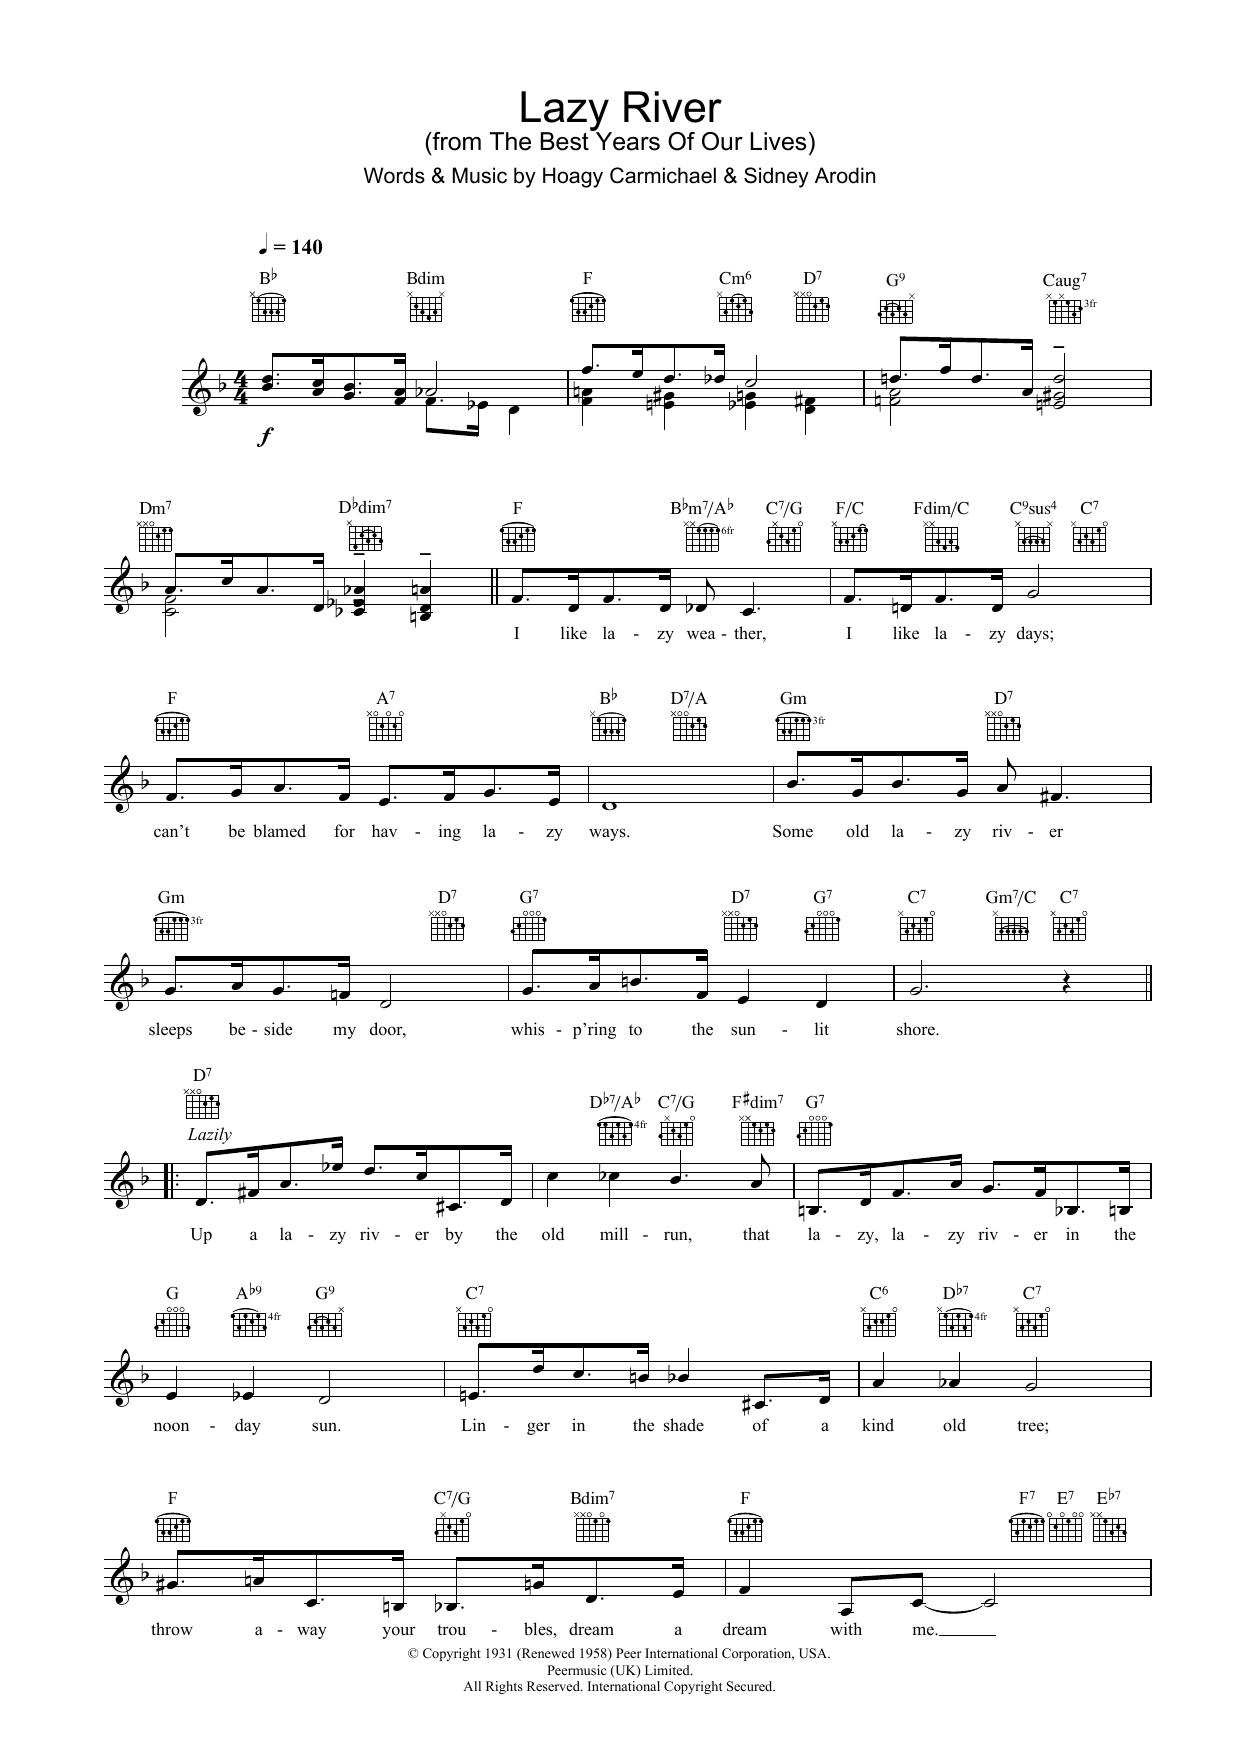 Bobby Darin - Lazy River